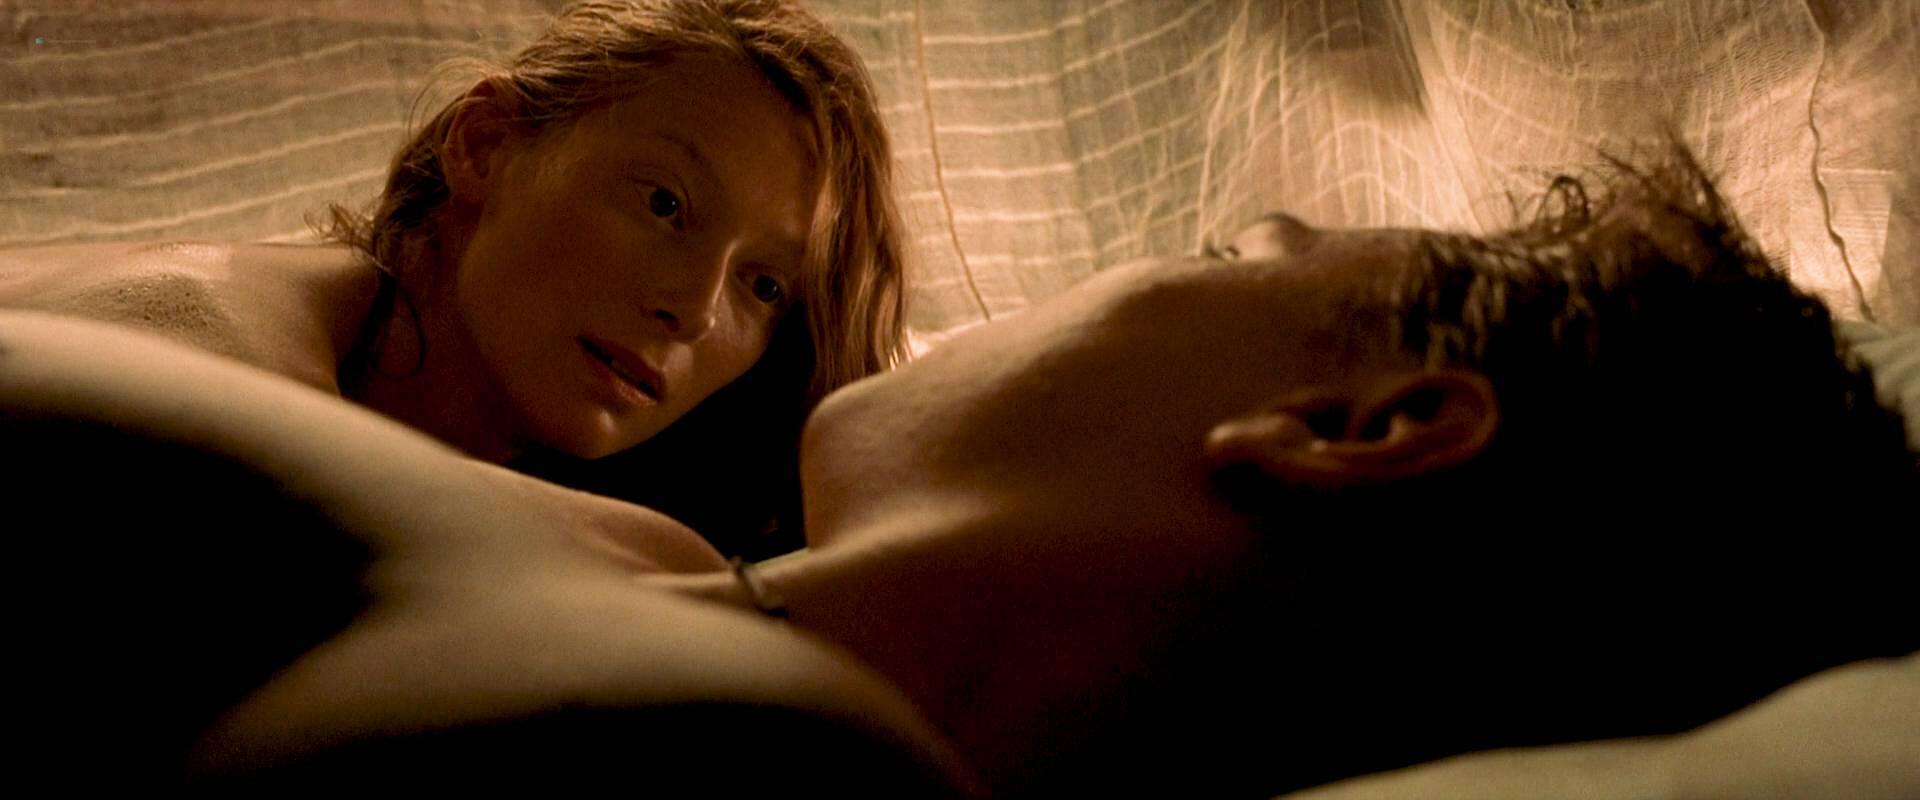 Virginie Ledoyen nude topless Tilda Swinton hot sex - The Beach (2000) HD 1080p BluRay (3)